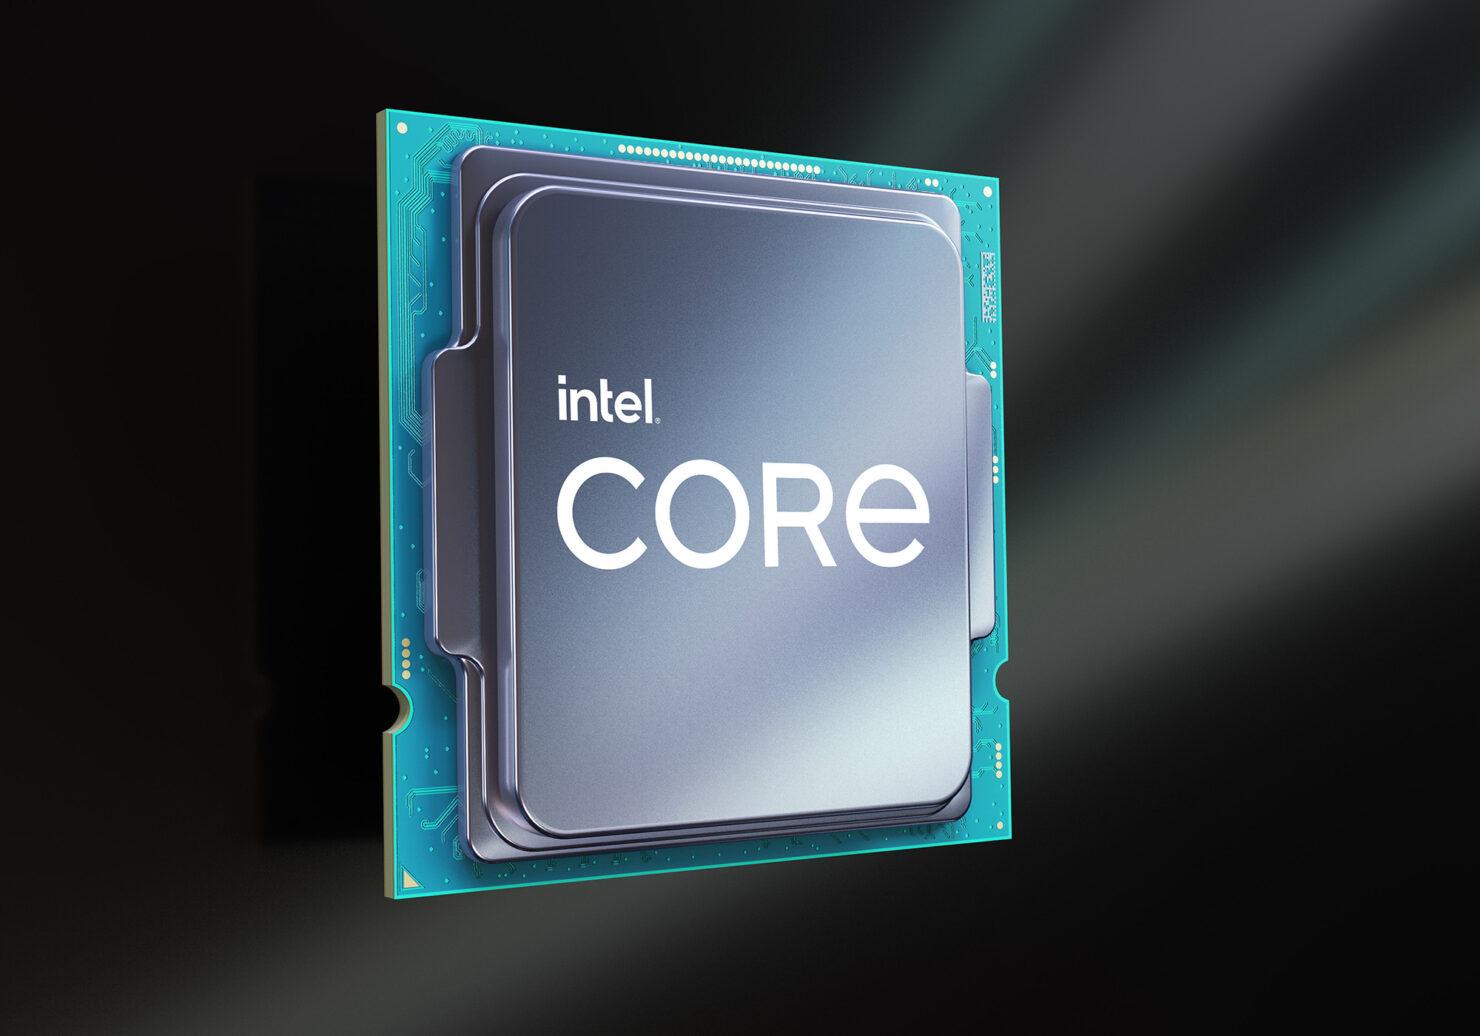 intel-core-i9-11900k-&-core-i7-11700k-rocket-lake-8-core-desktop-cpu-benchmarks-leak-–-flagship-overclocked-to-5.3-ghz-on-all-cores